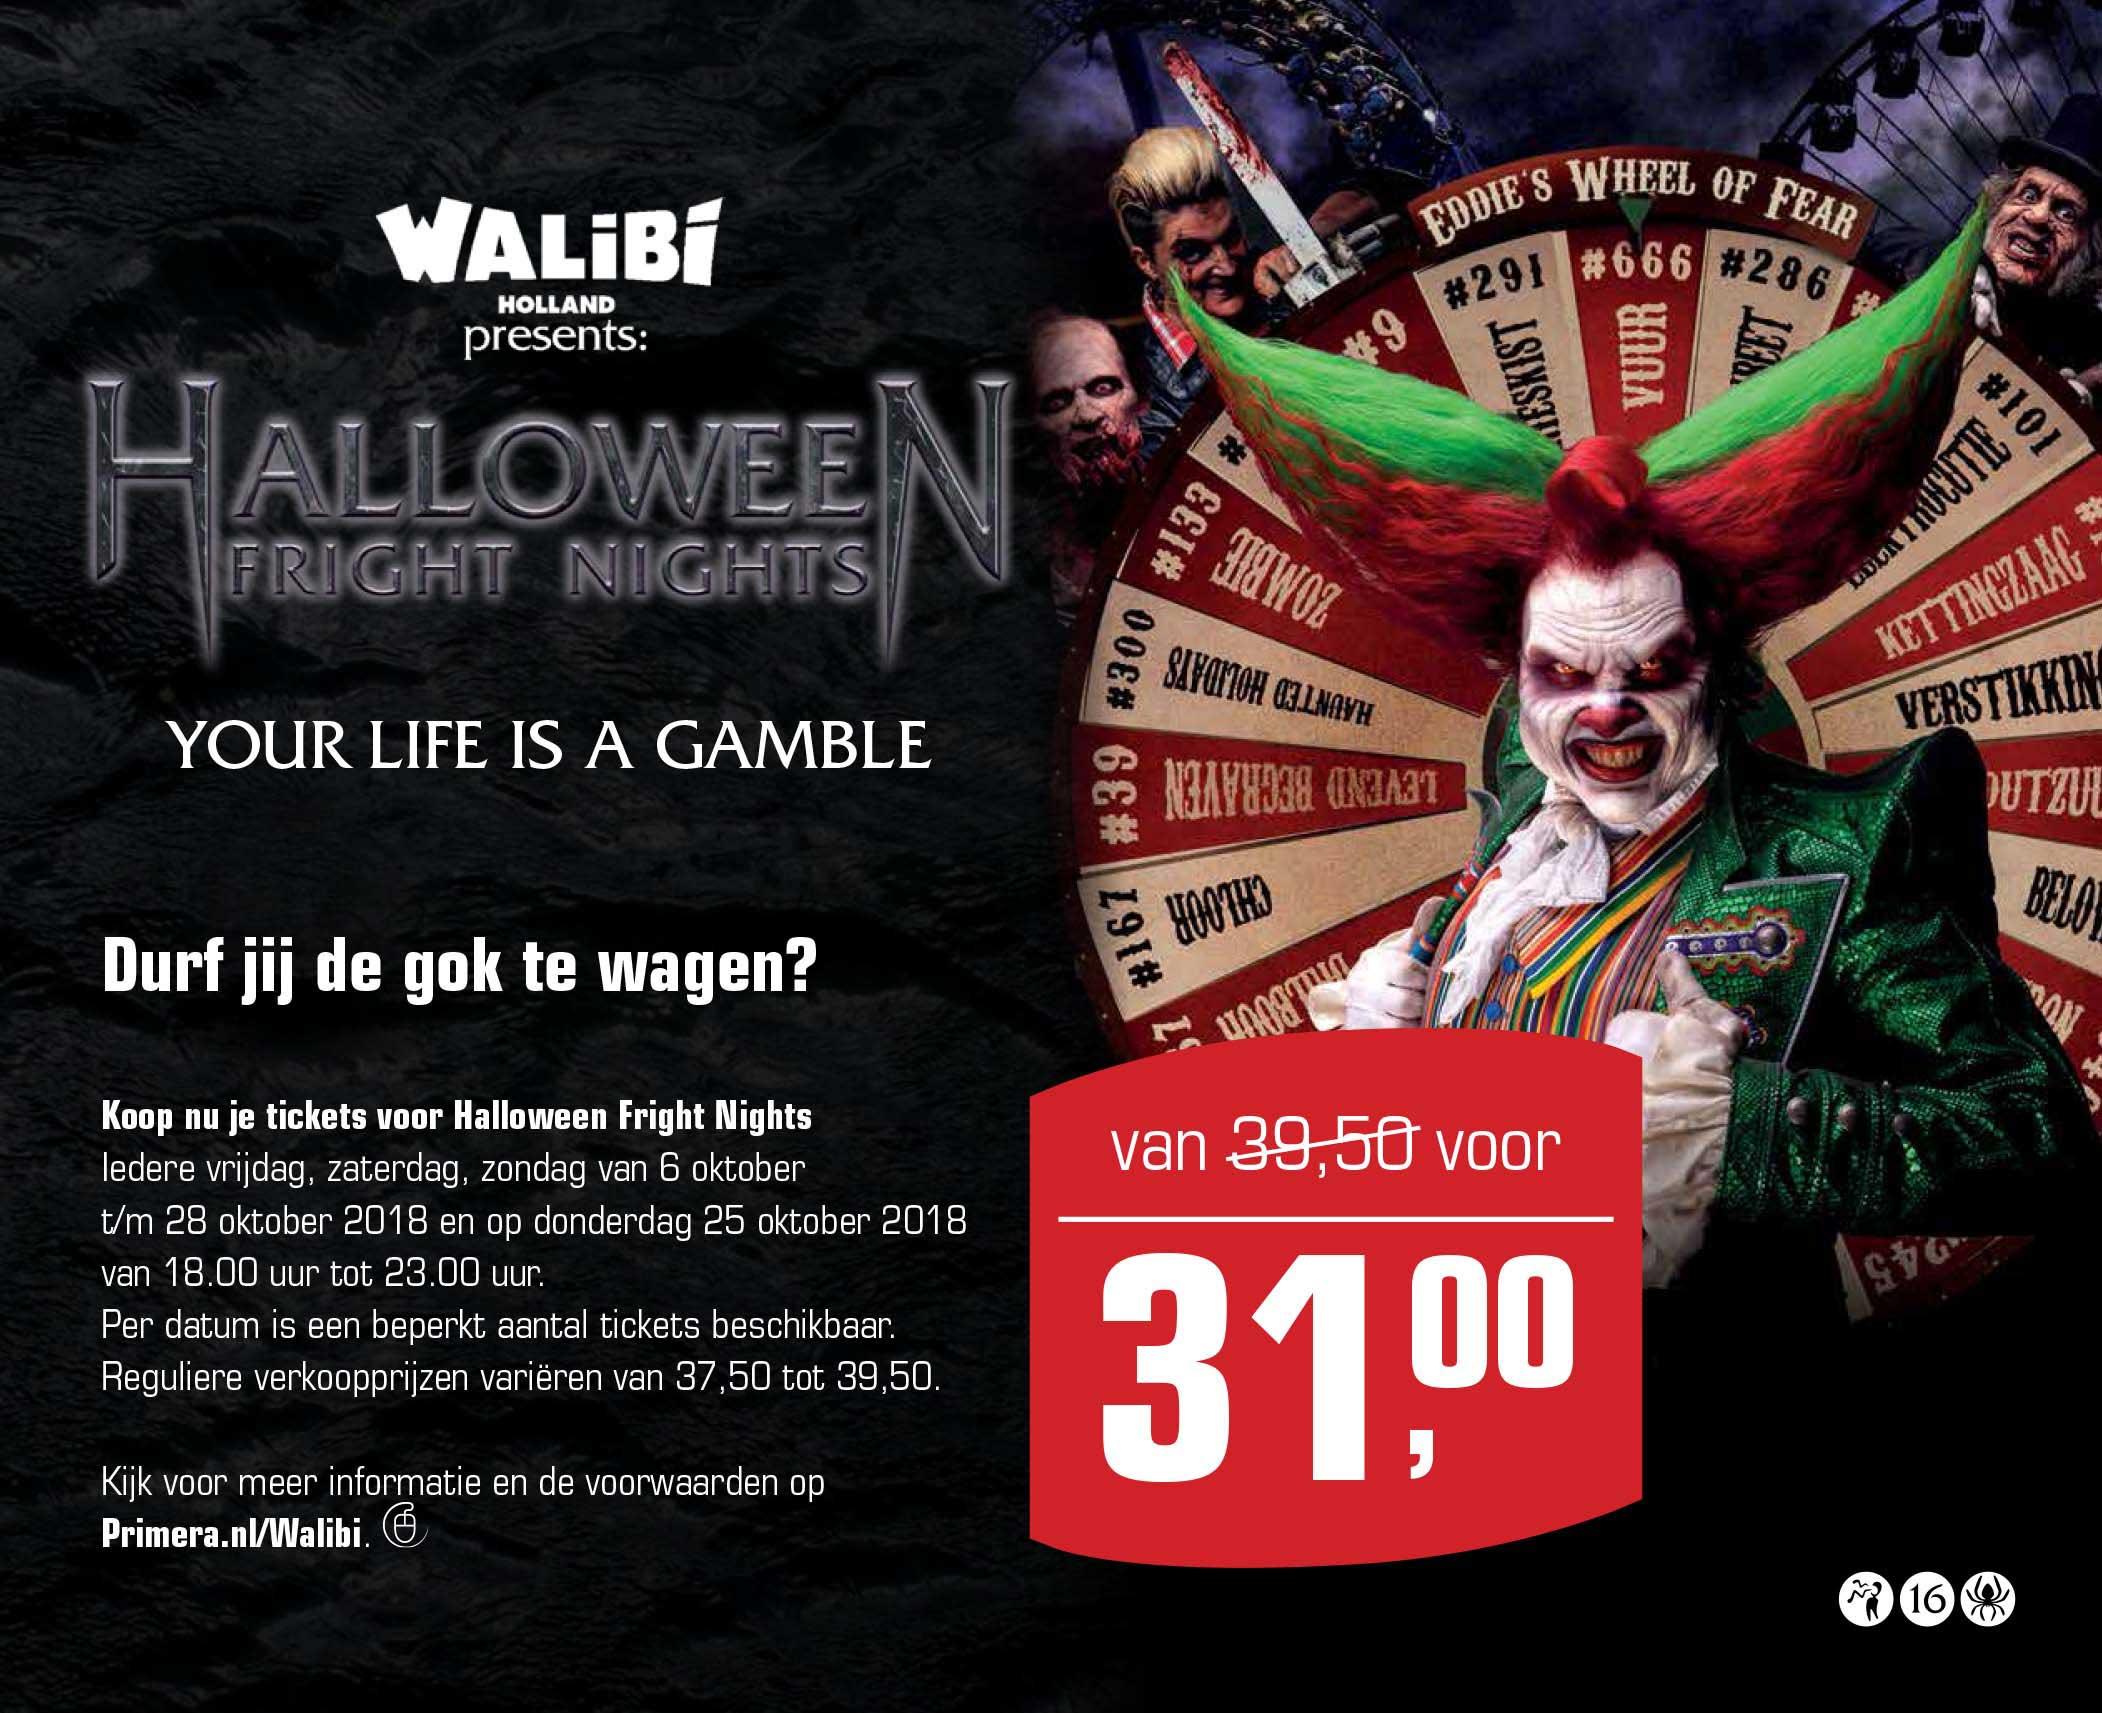 Primera Halloween Fright Nights: €8,50 Korting